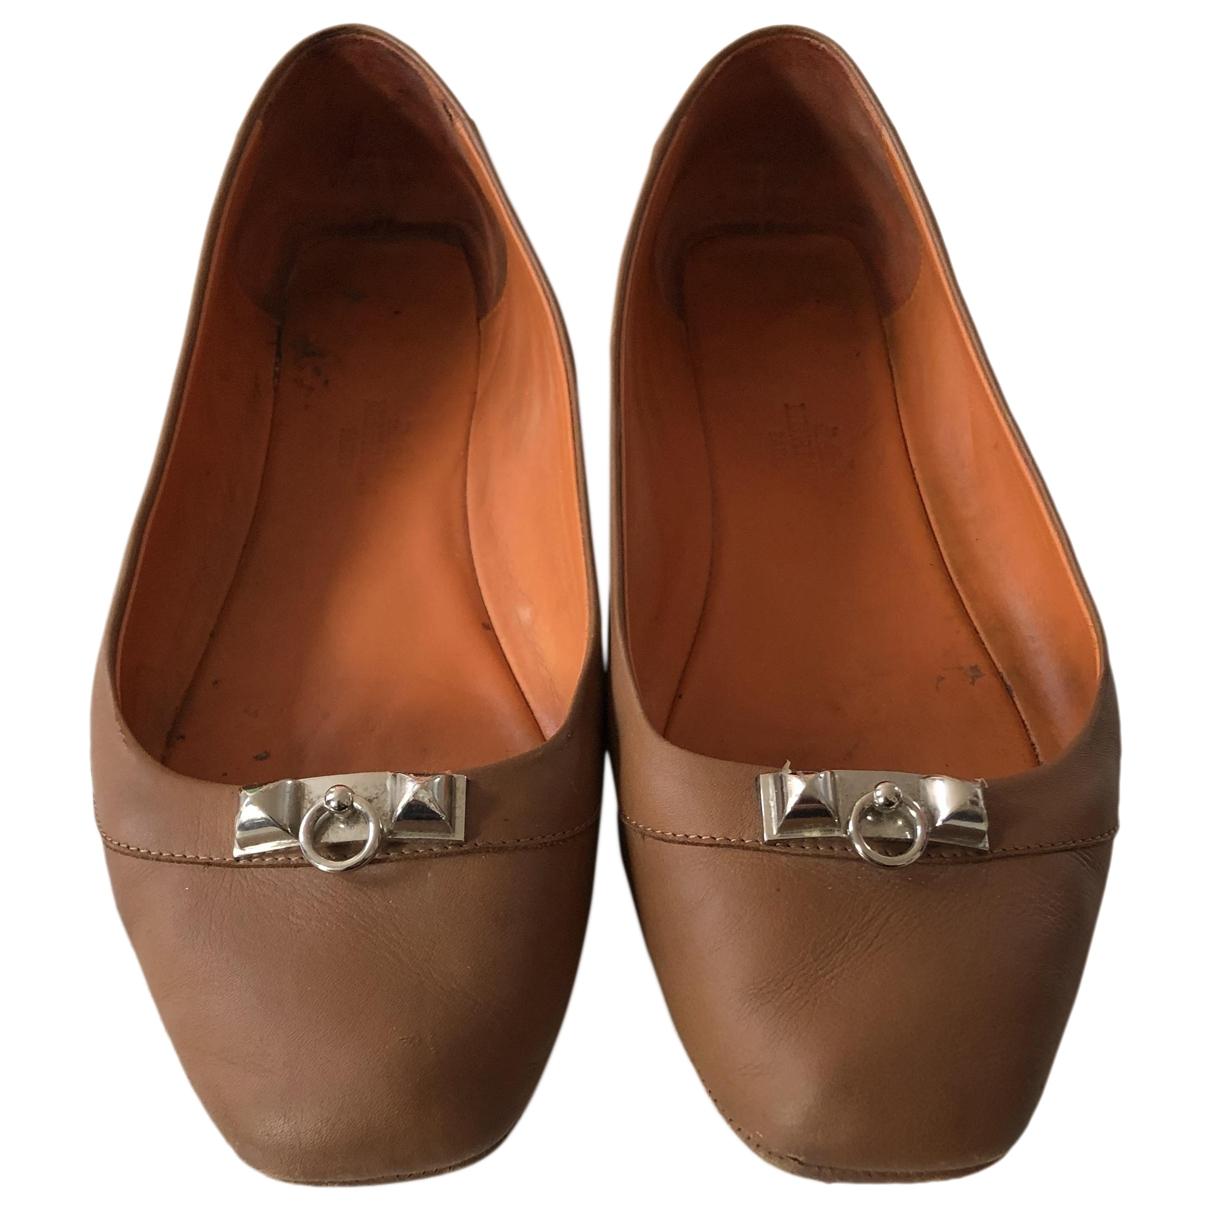 Hermès \N Brown Leather Ballet flats for Women 37 EU